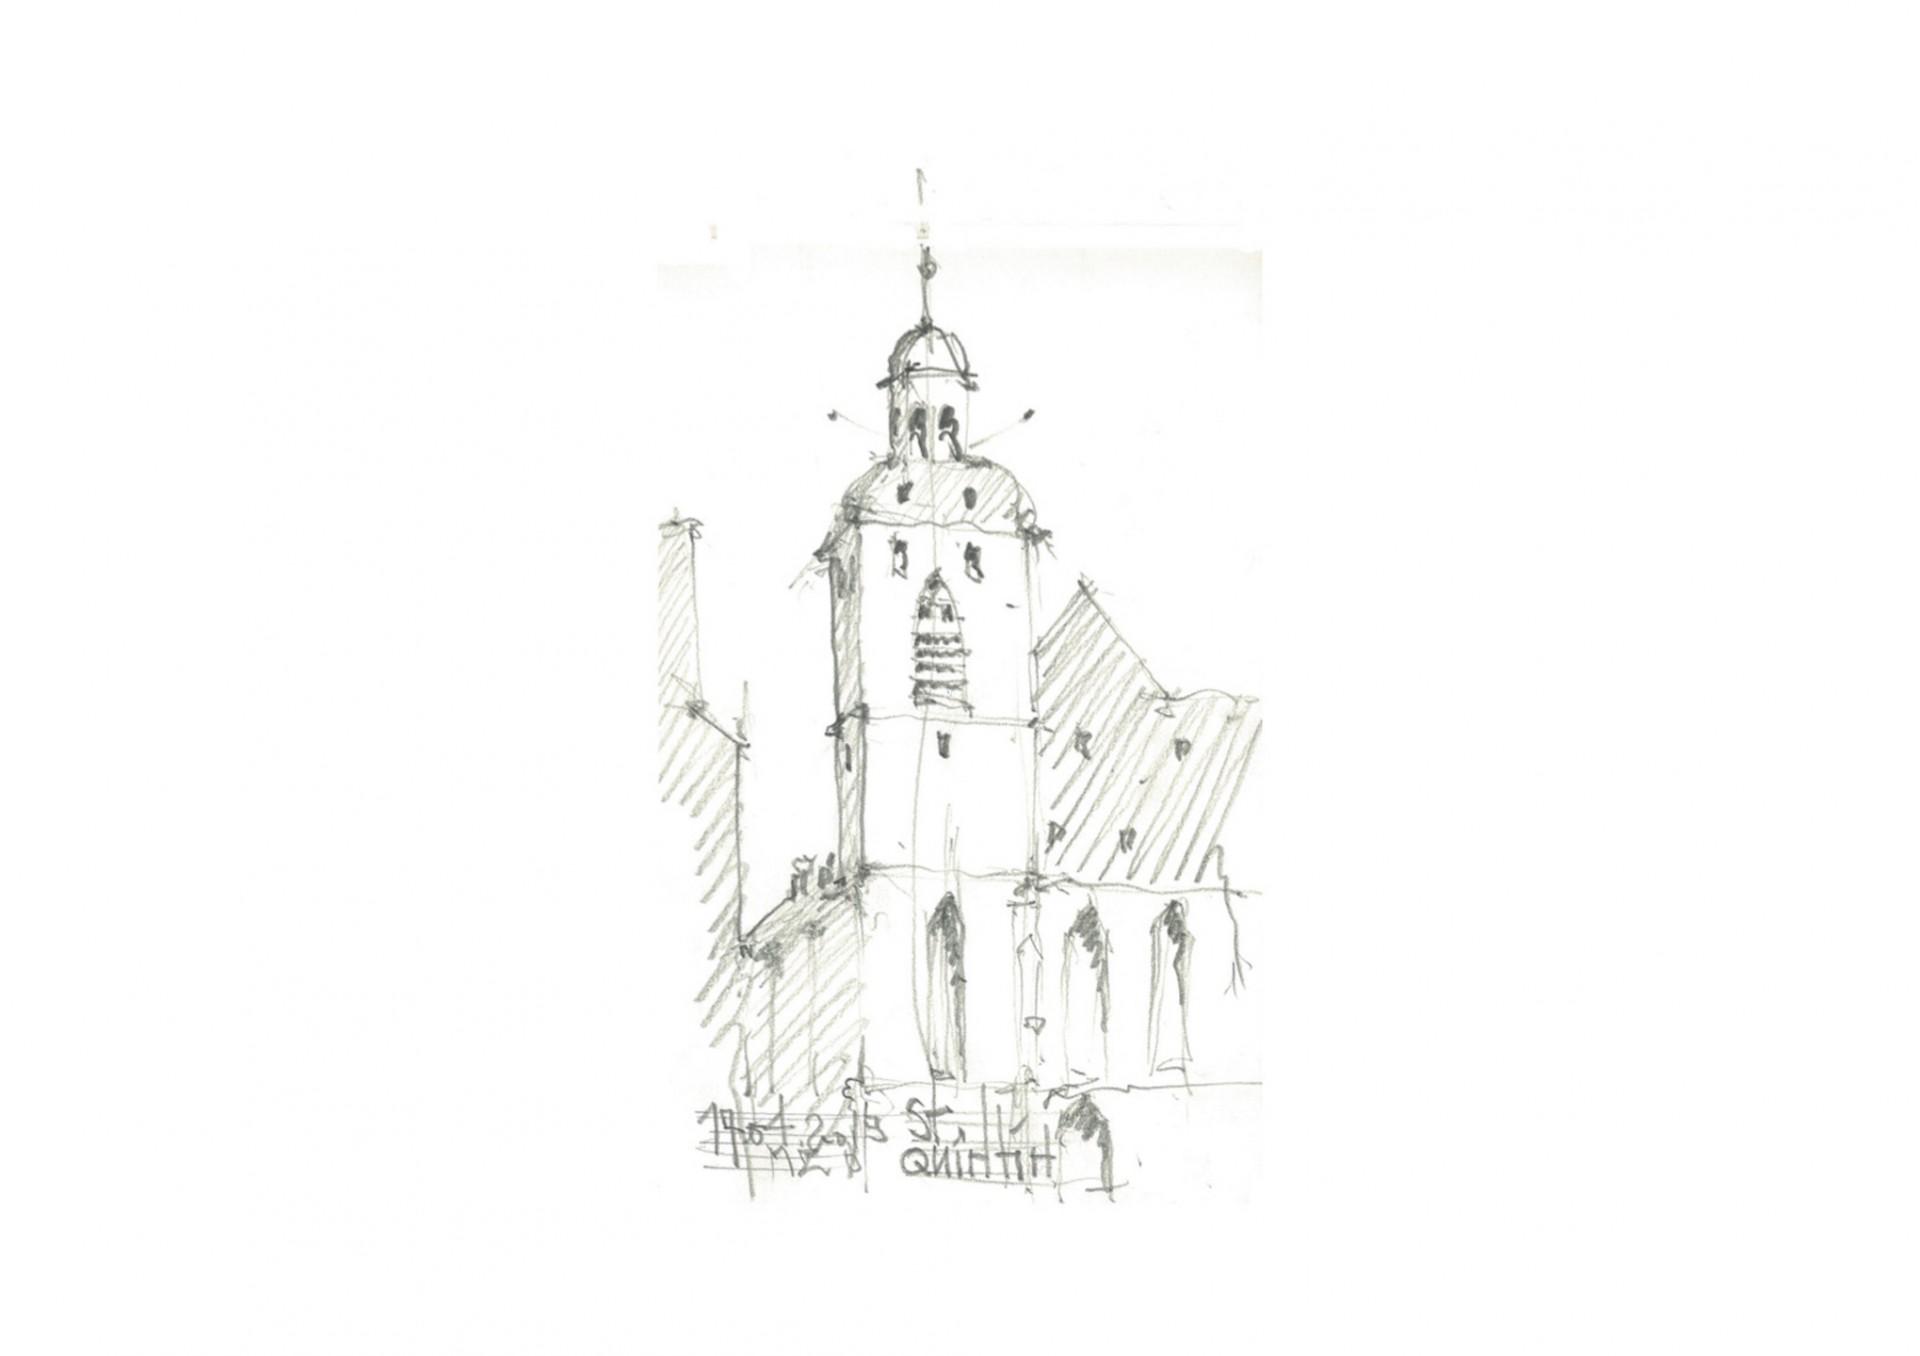 St. Quintin, Mainz